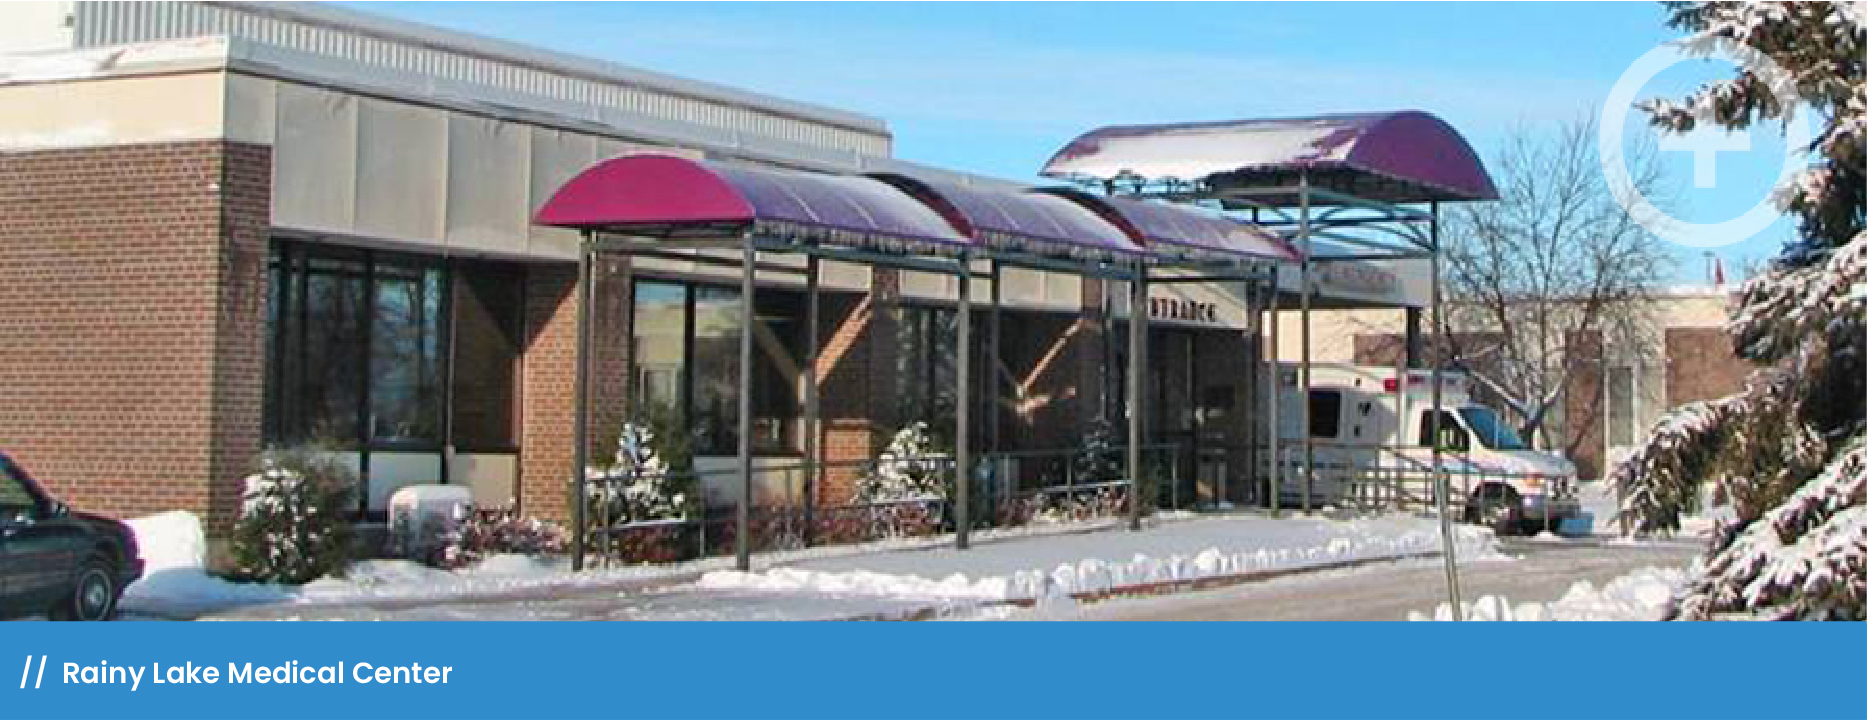 Yanik-Watermark_Rainy Lake Medical Center-